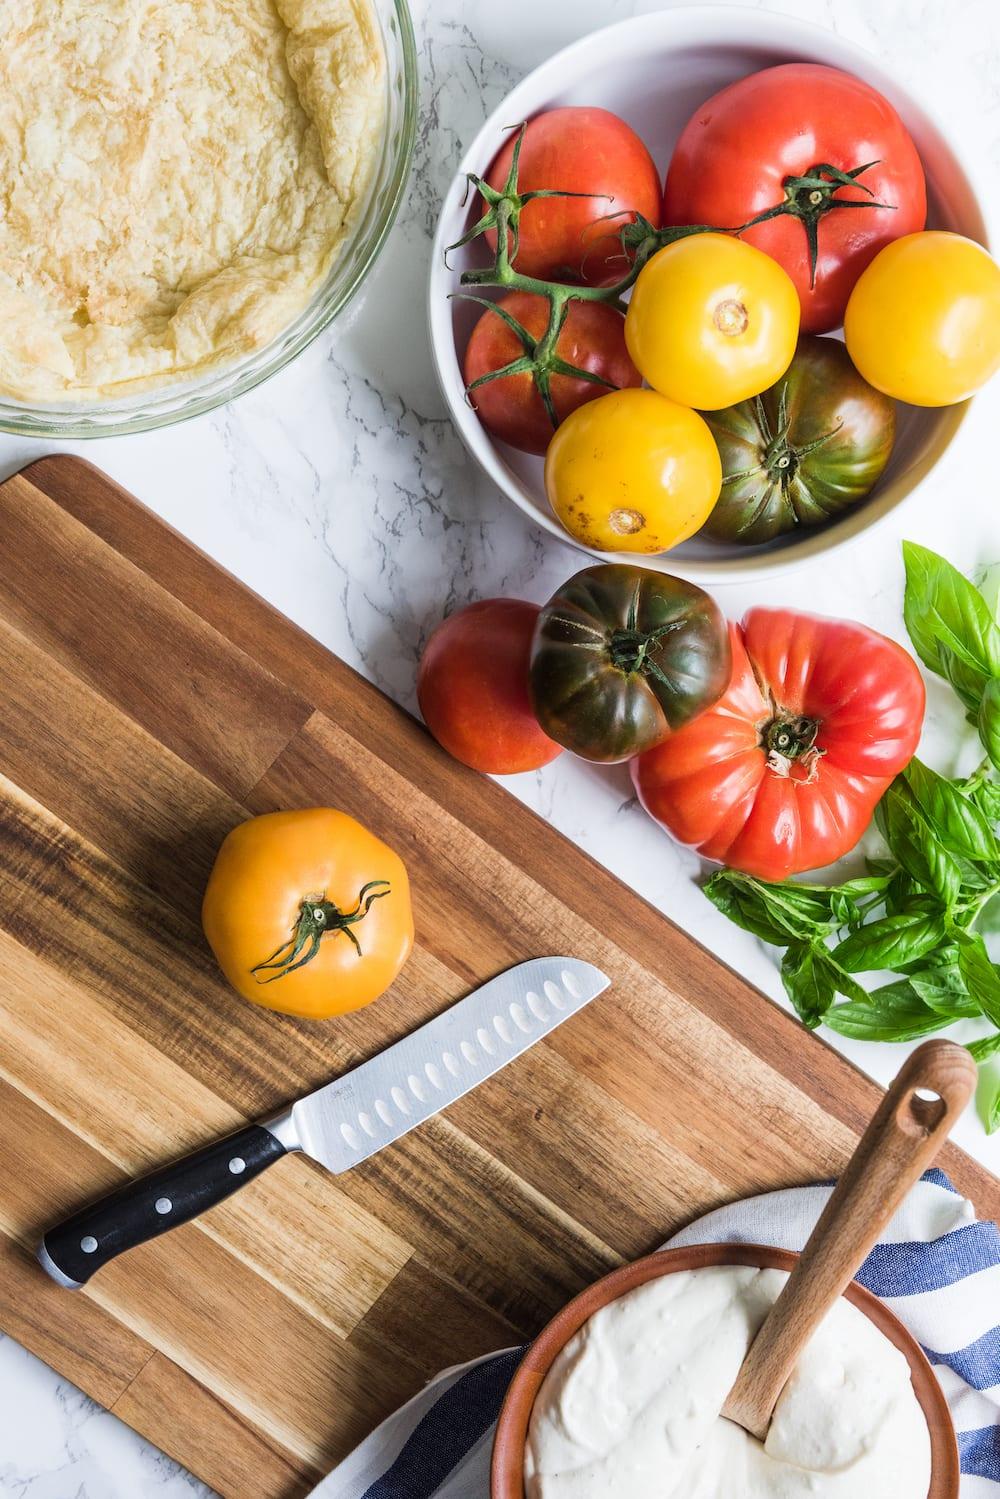 An Easy Tomato Tart: Entertaining ideas, summer party ideas, easy summer recipes from @cydconverse